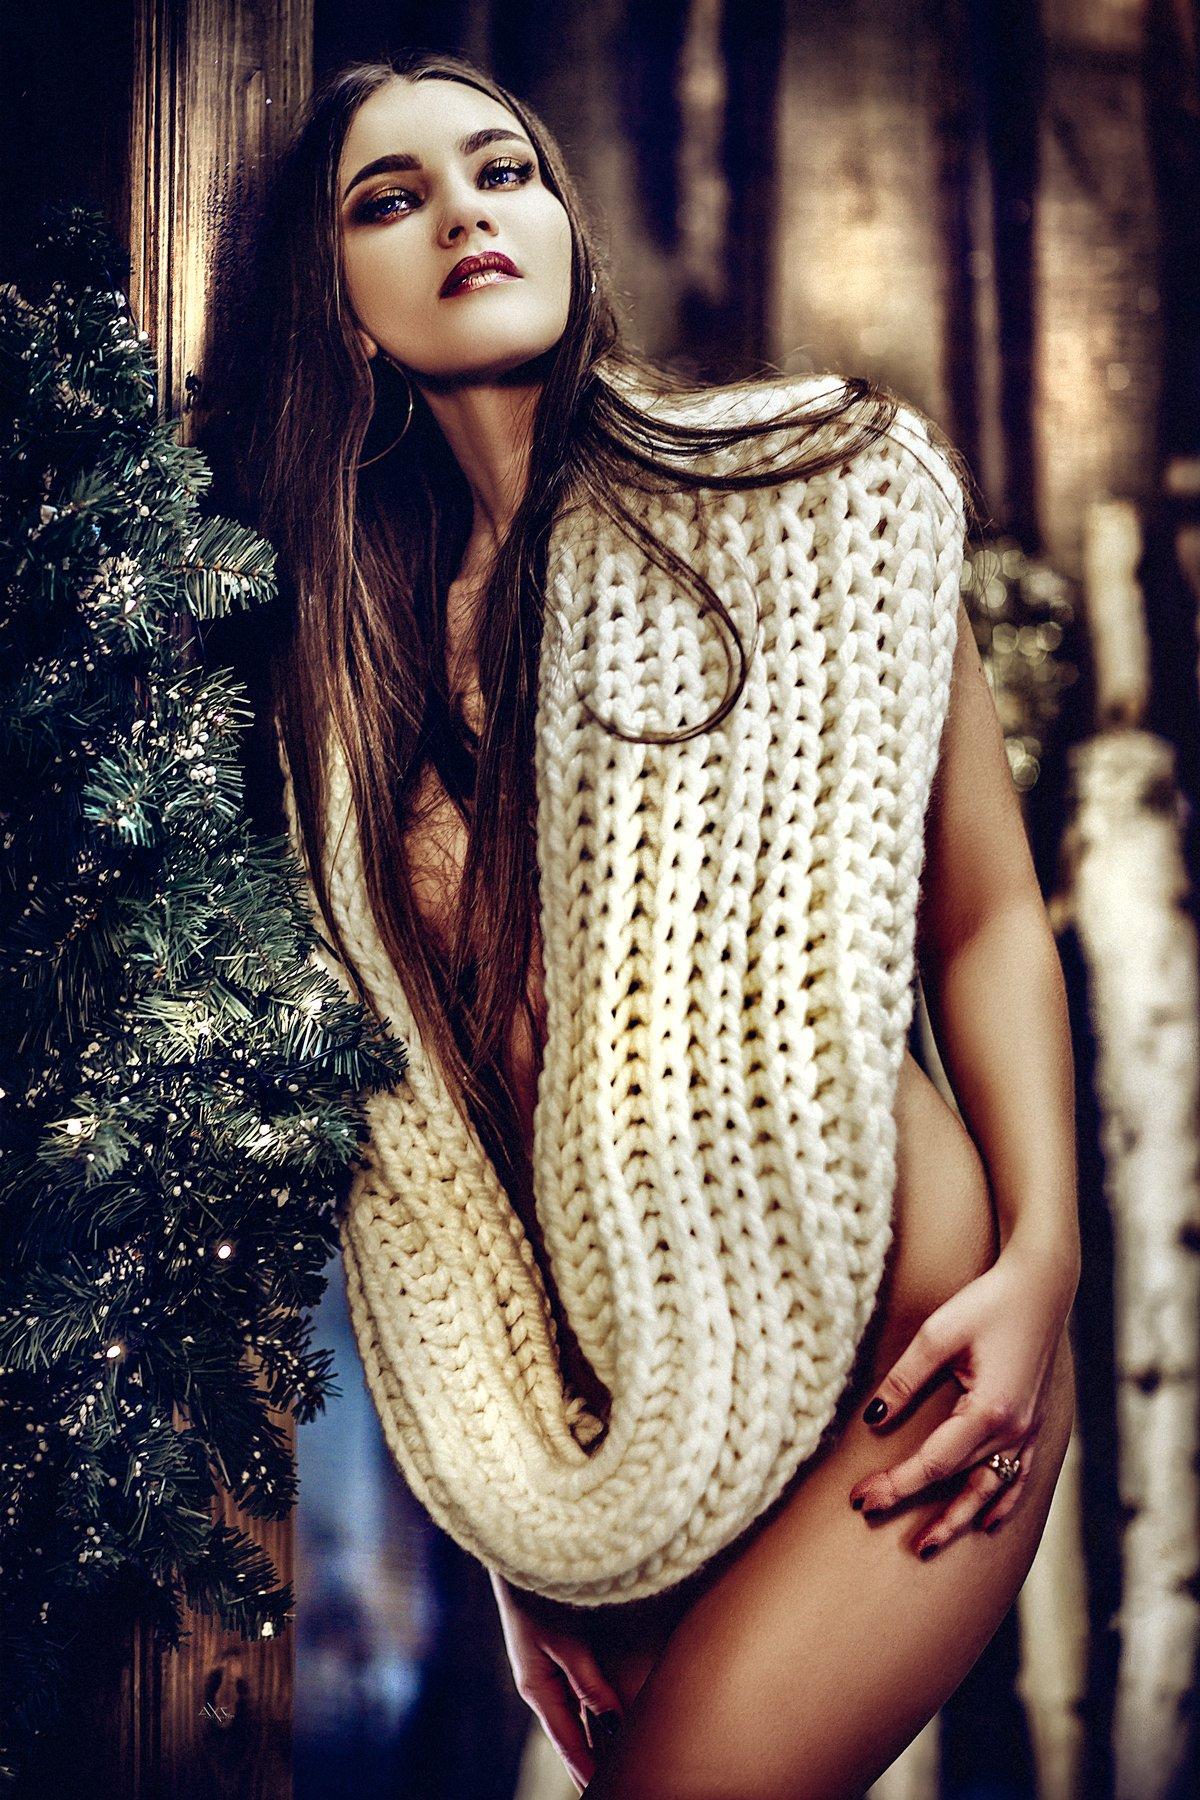 woman, portrait, studio, mood, christmas, beauty, Руслан Болгов (Axe)